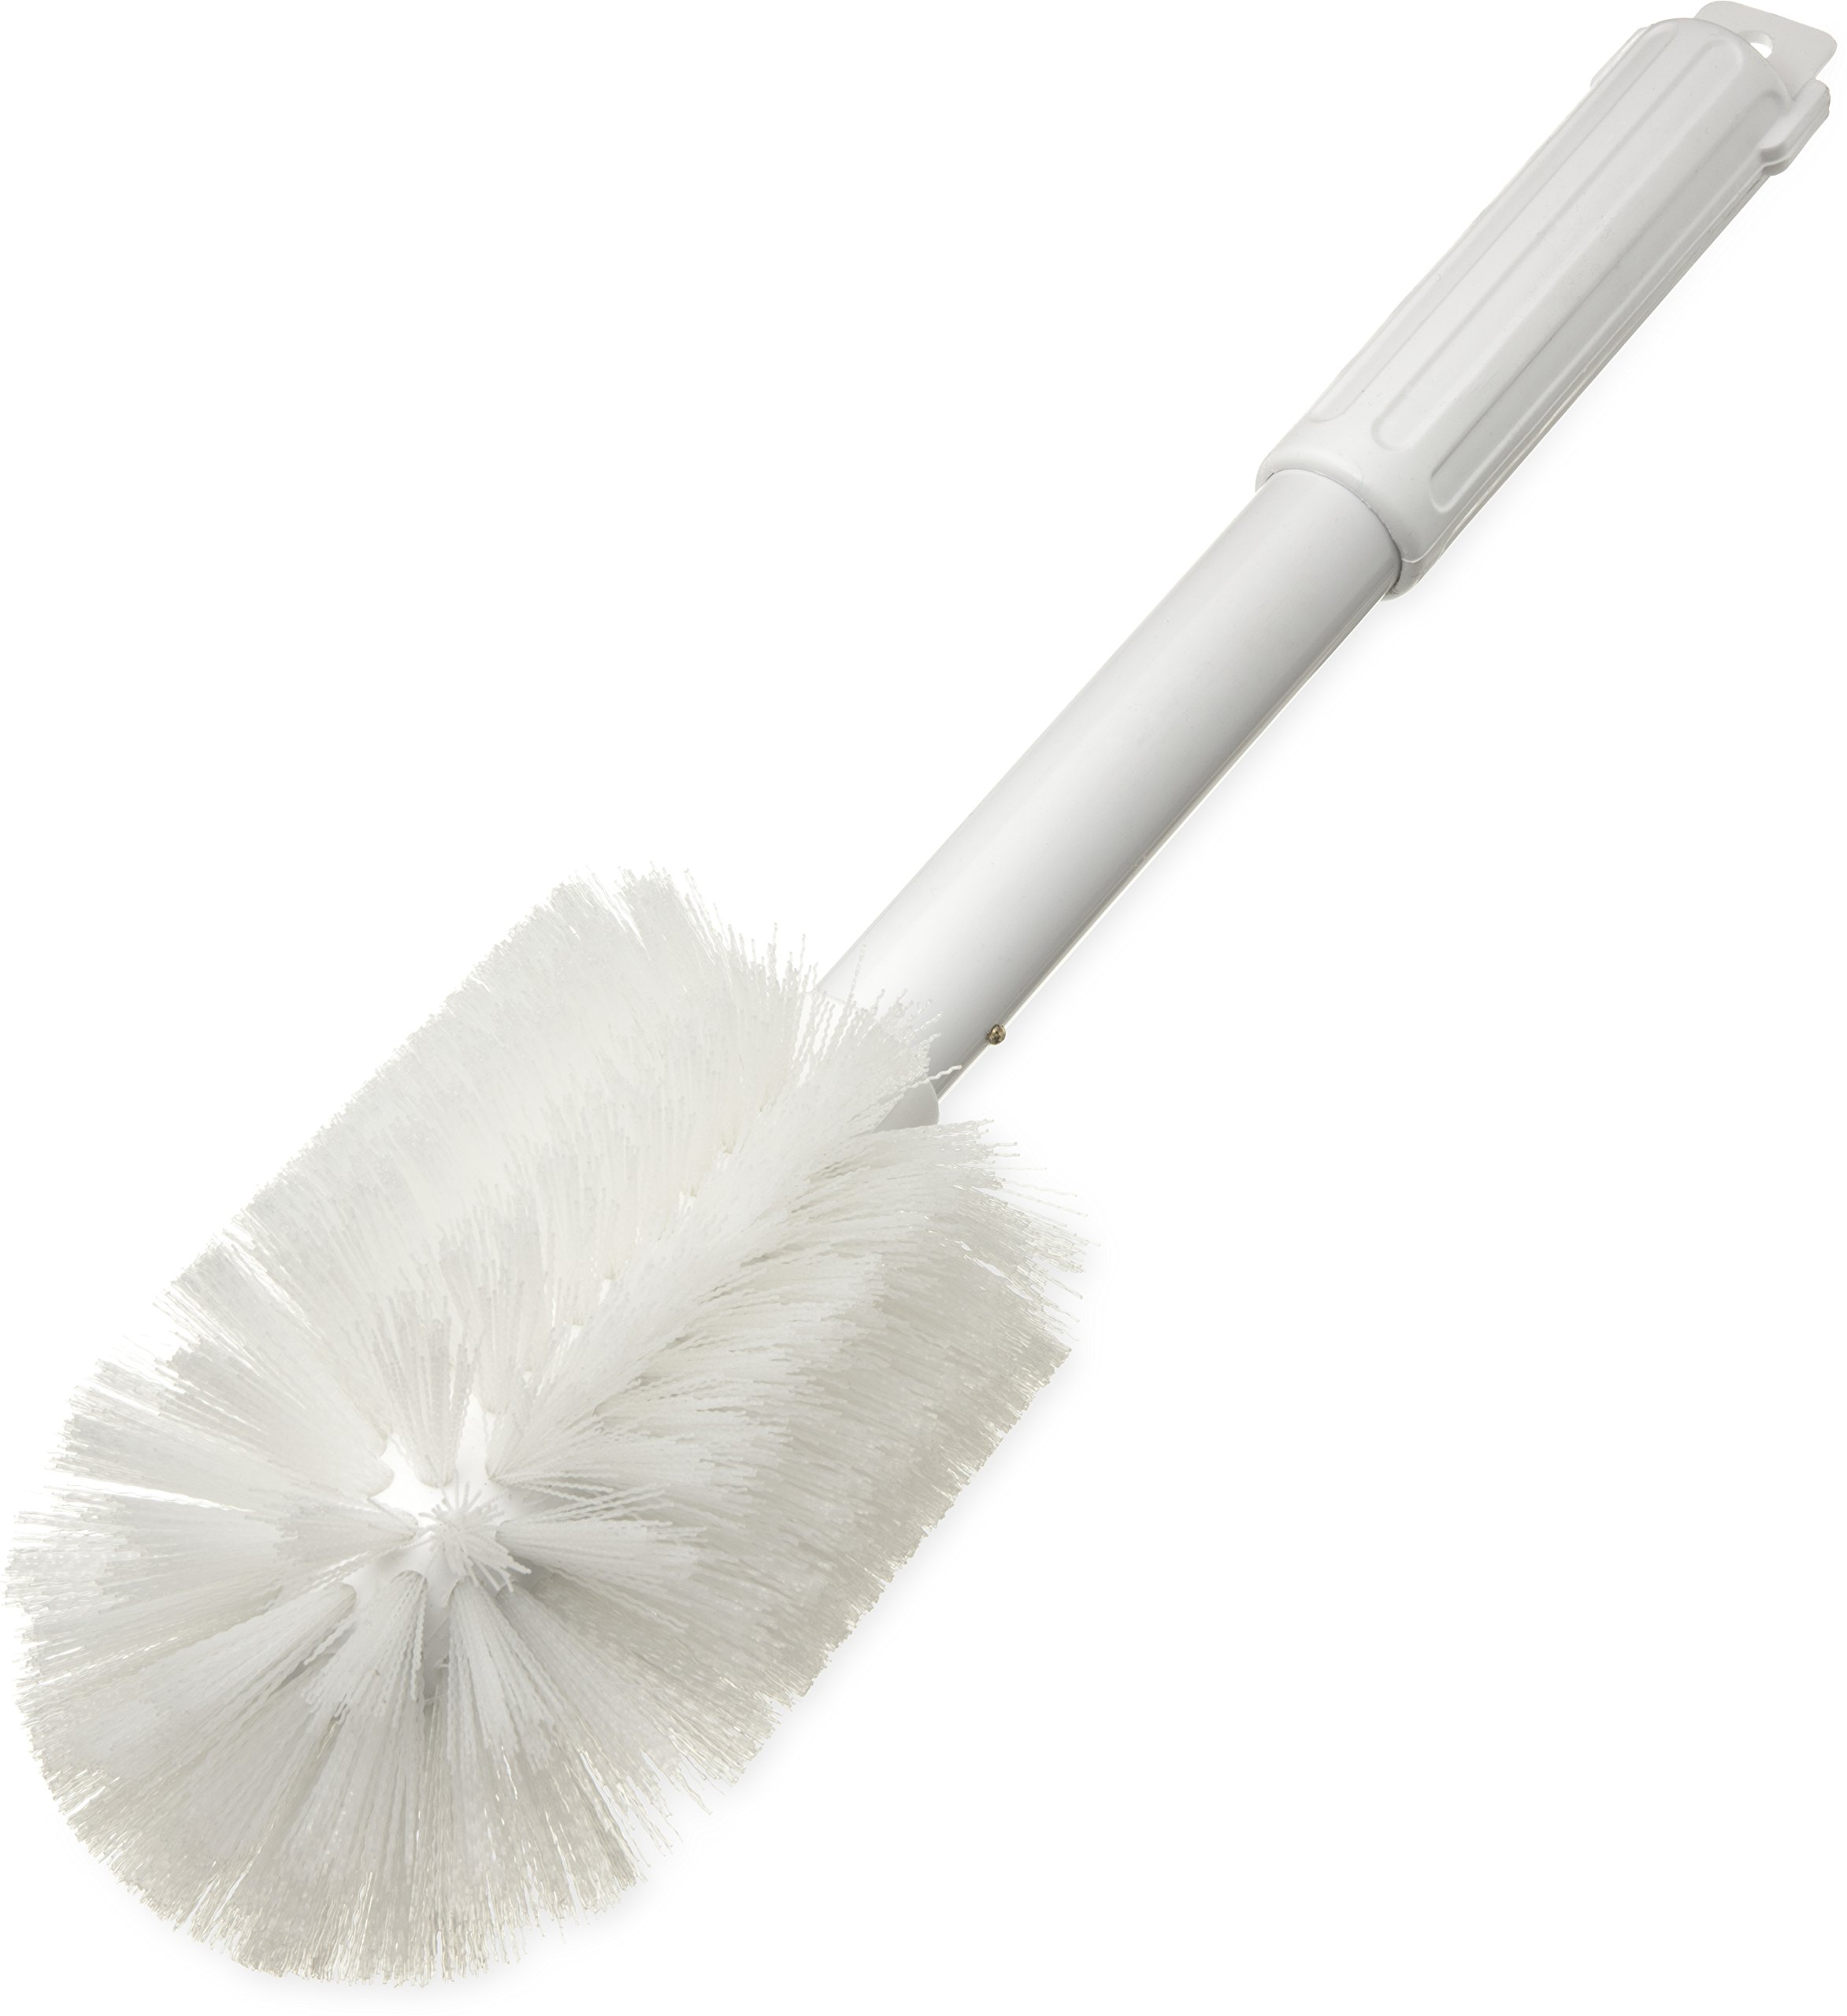 "Carlisle 4000502 Multi-Purpose Round Valve Brush, 4"" Polyester Bristles, 16"" Length, White"